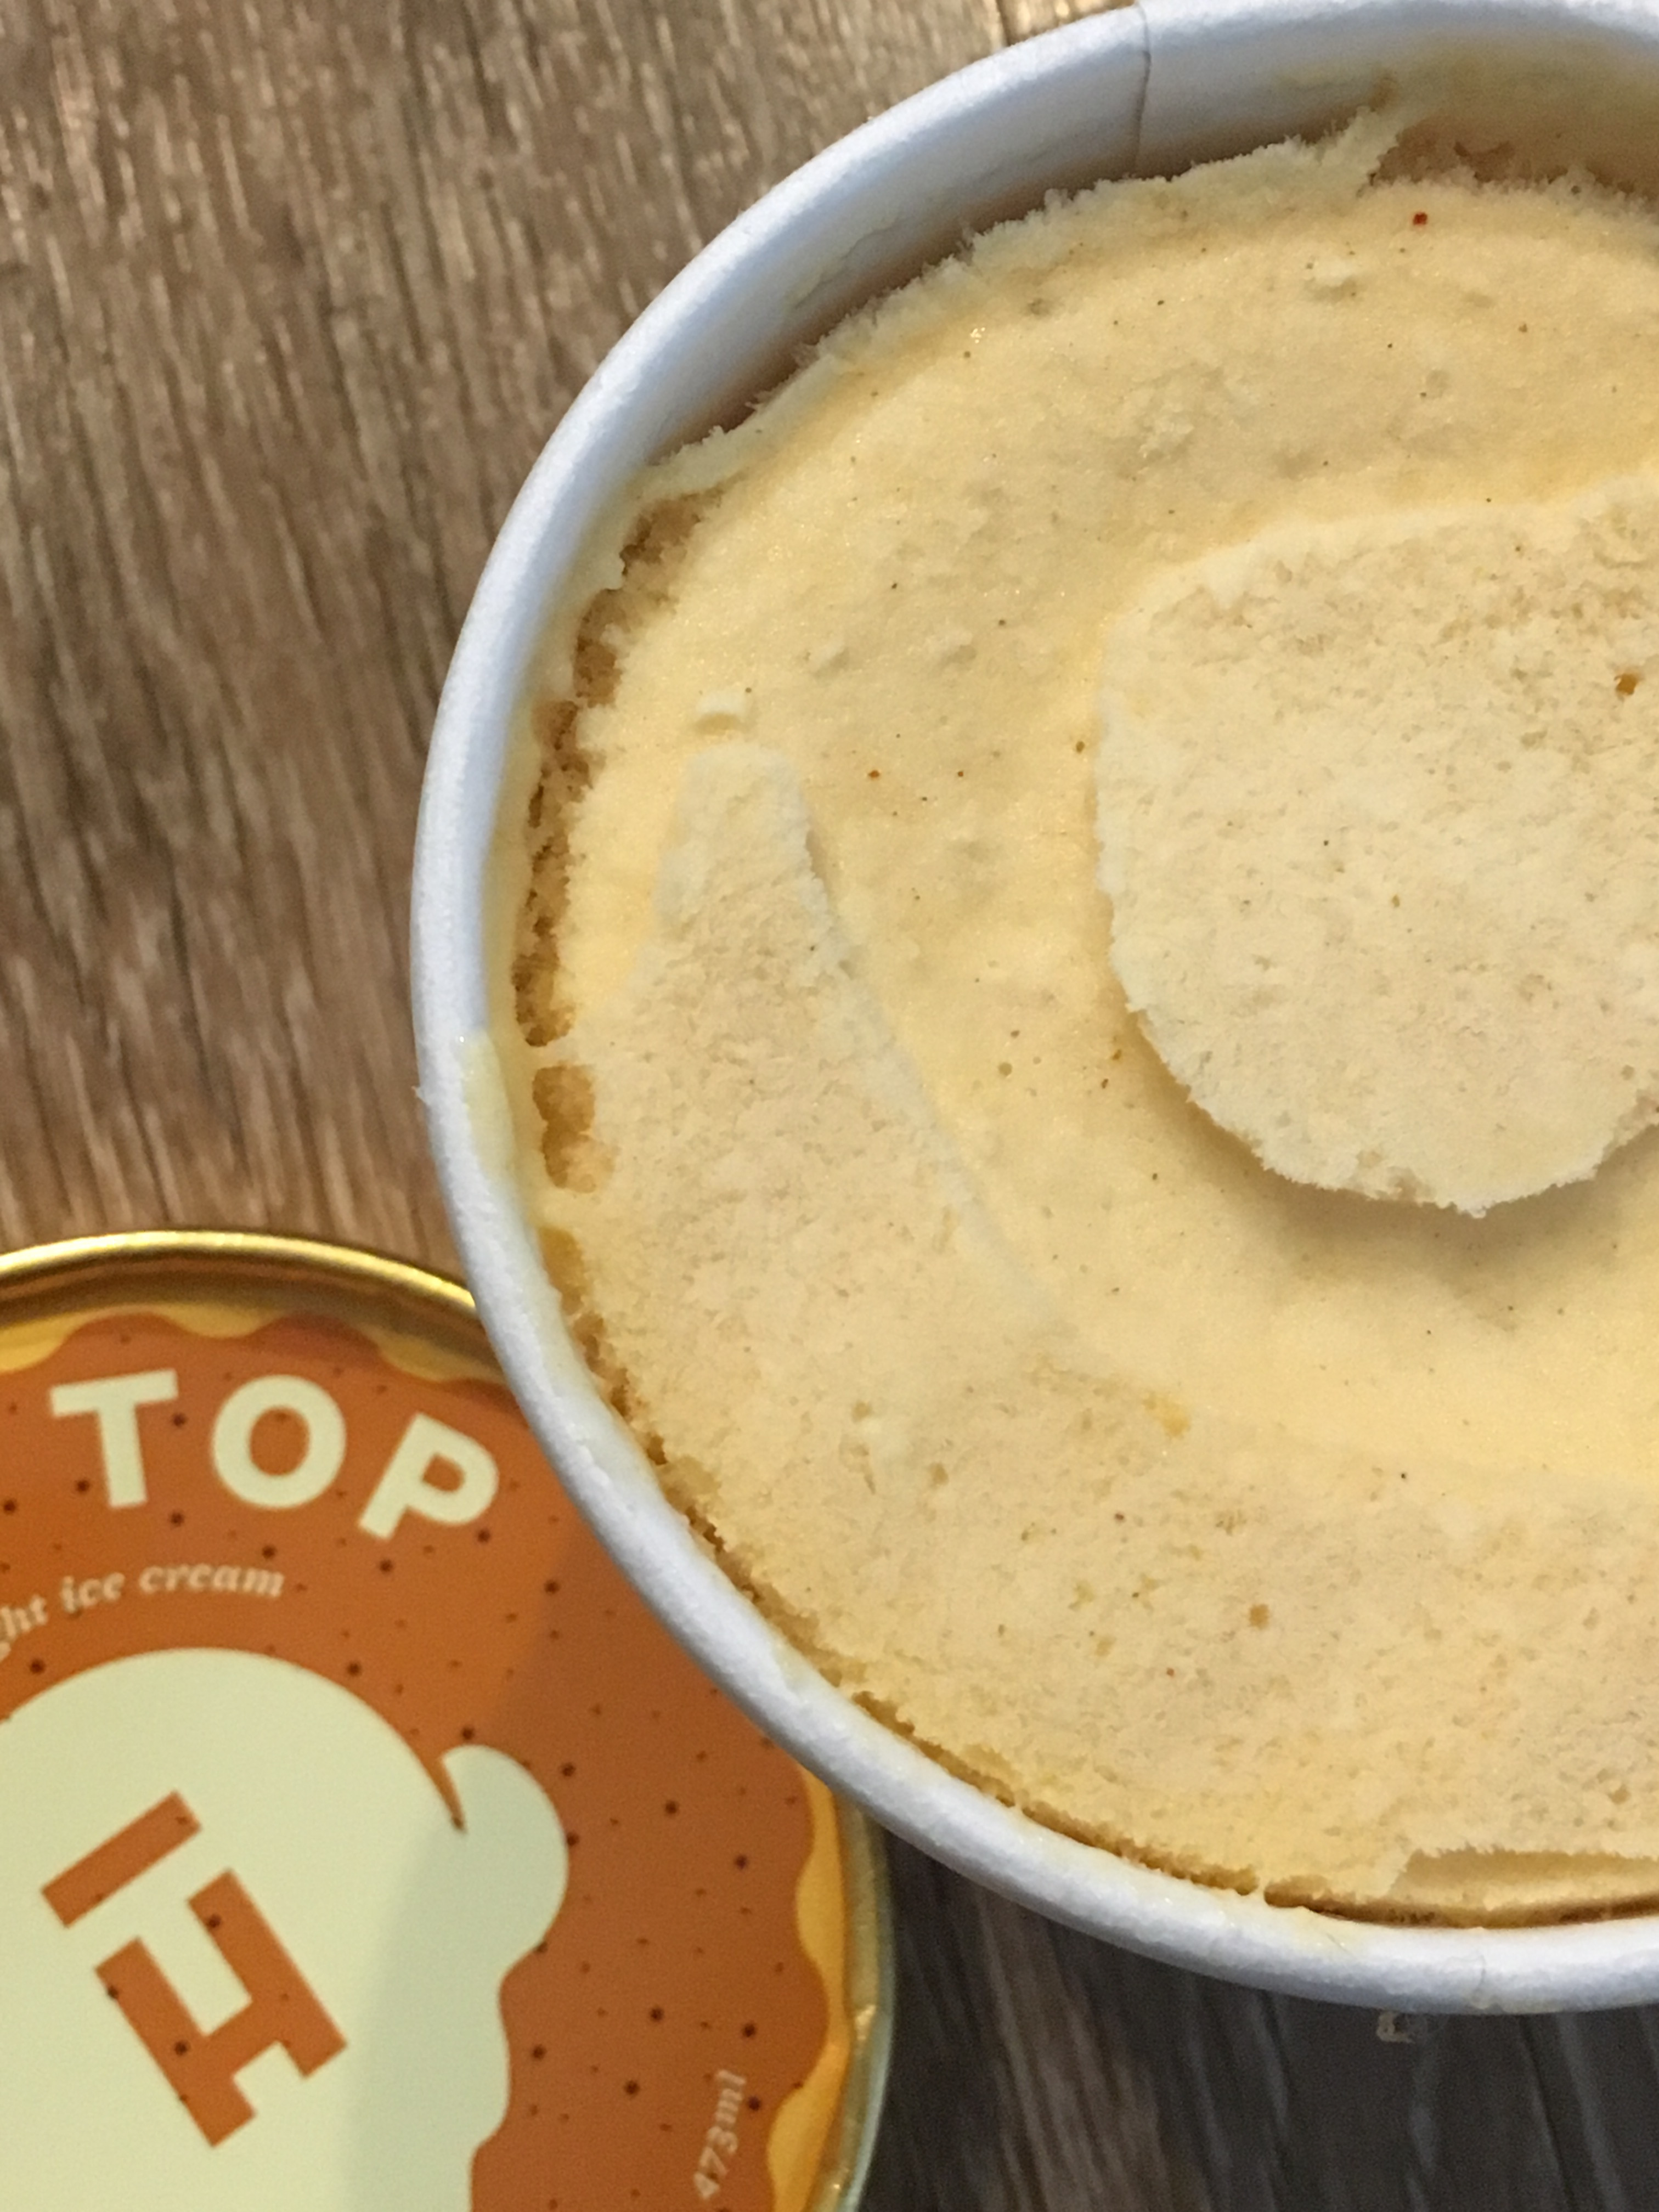 Halo Top Pumpkin Pie  Halo Top Pumpkin Pie Review Snack Gator